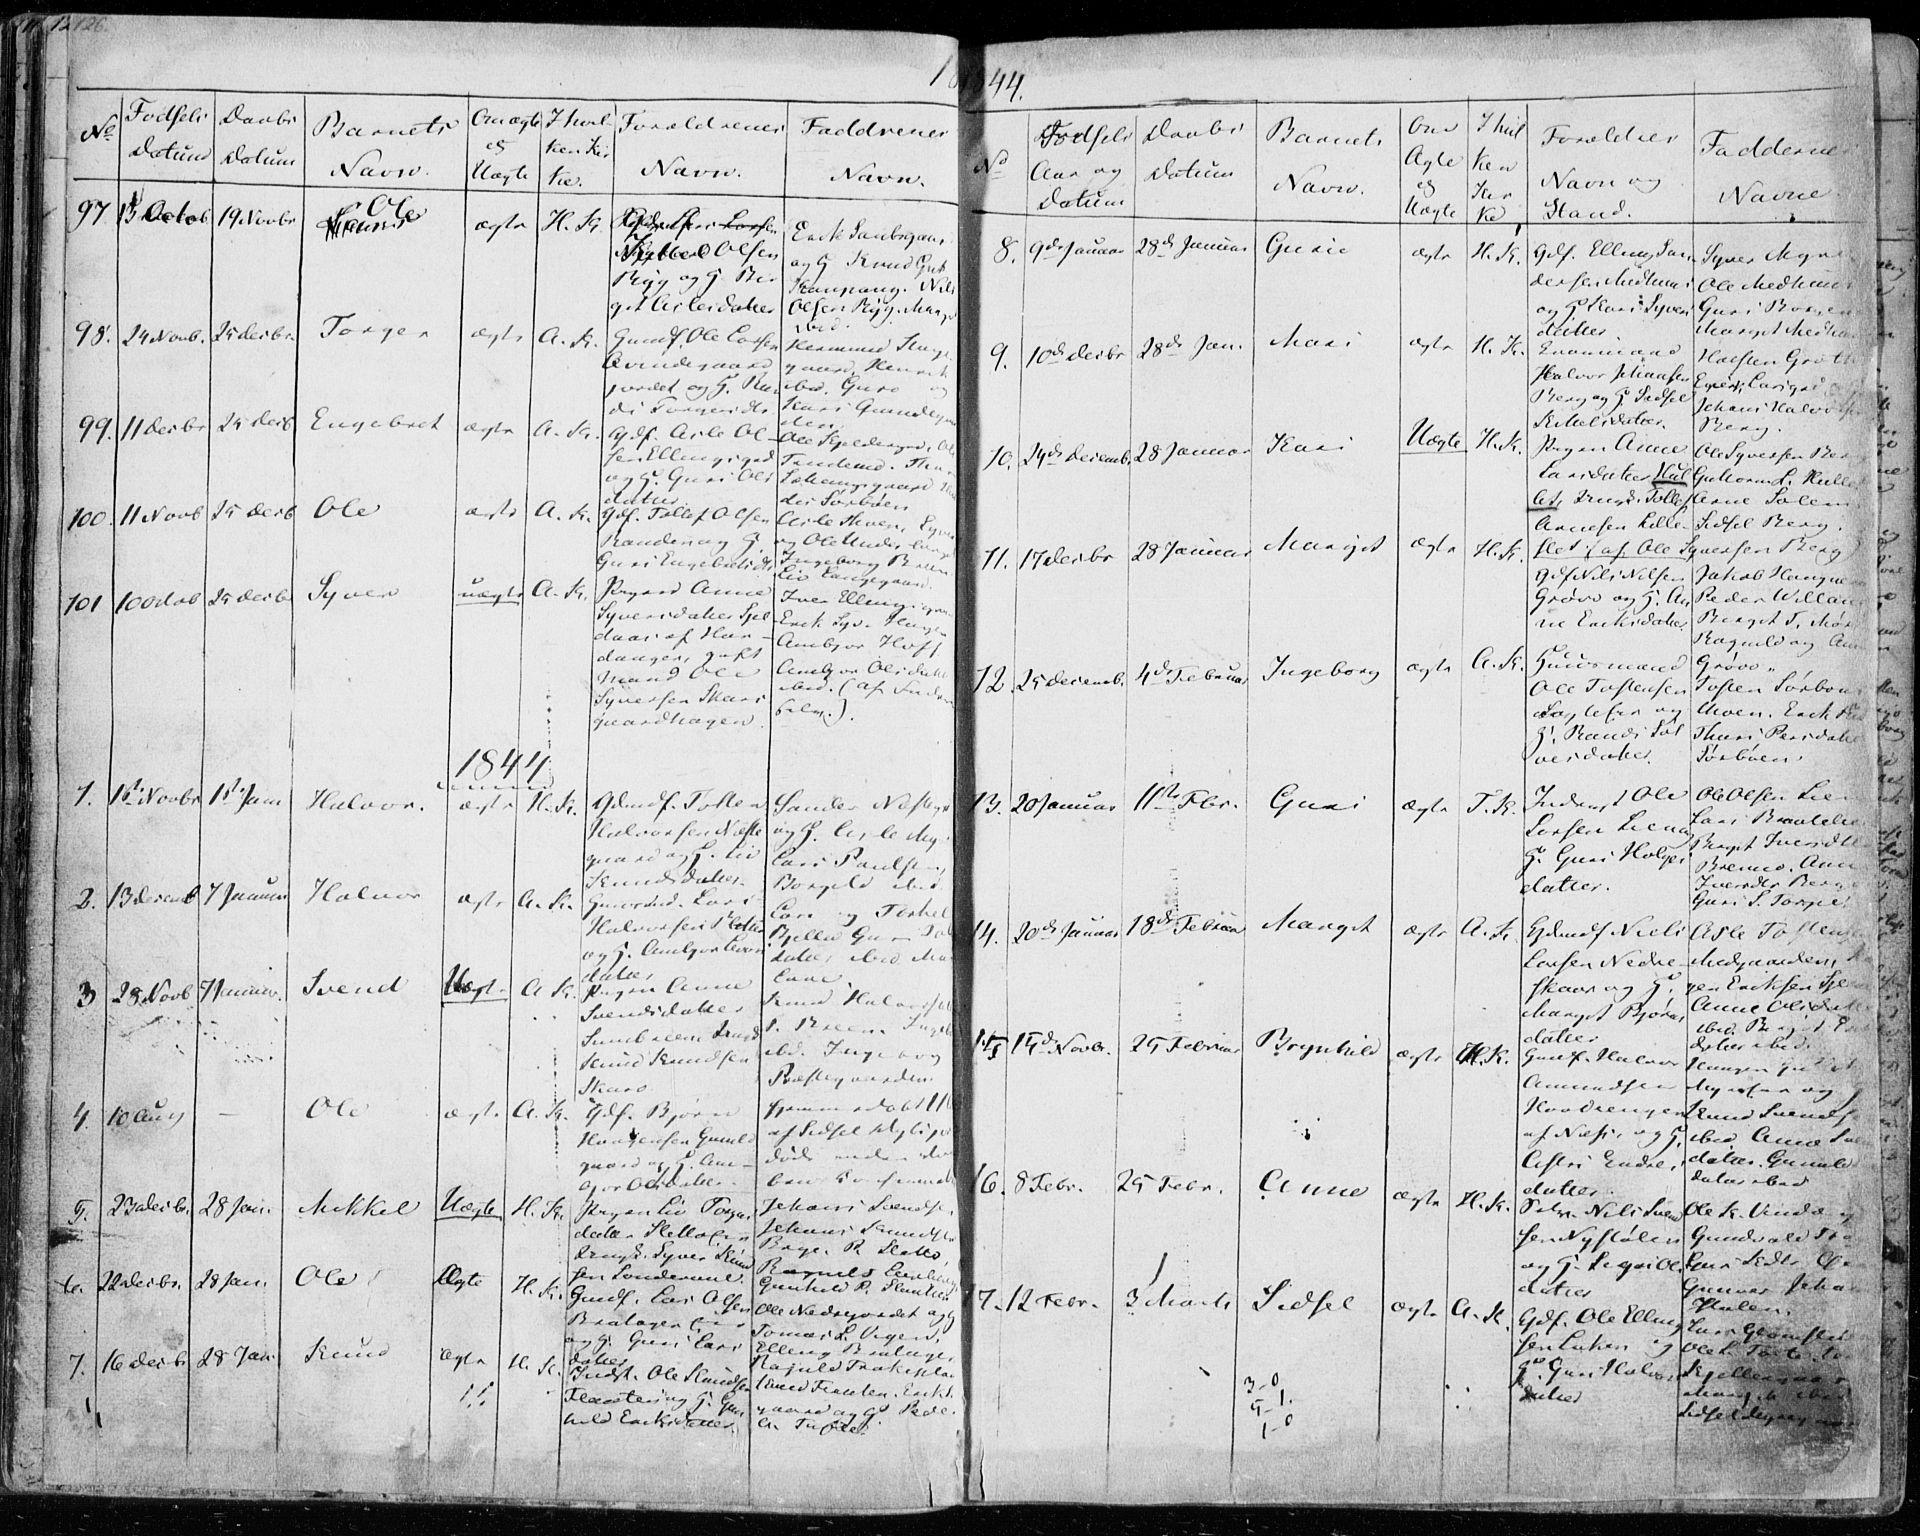 SAKO, Ål kirkebøker, F/Fa/L0005: Parish register (official) no. I 5, 1825-1848, p. 126